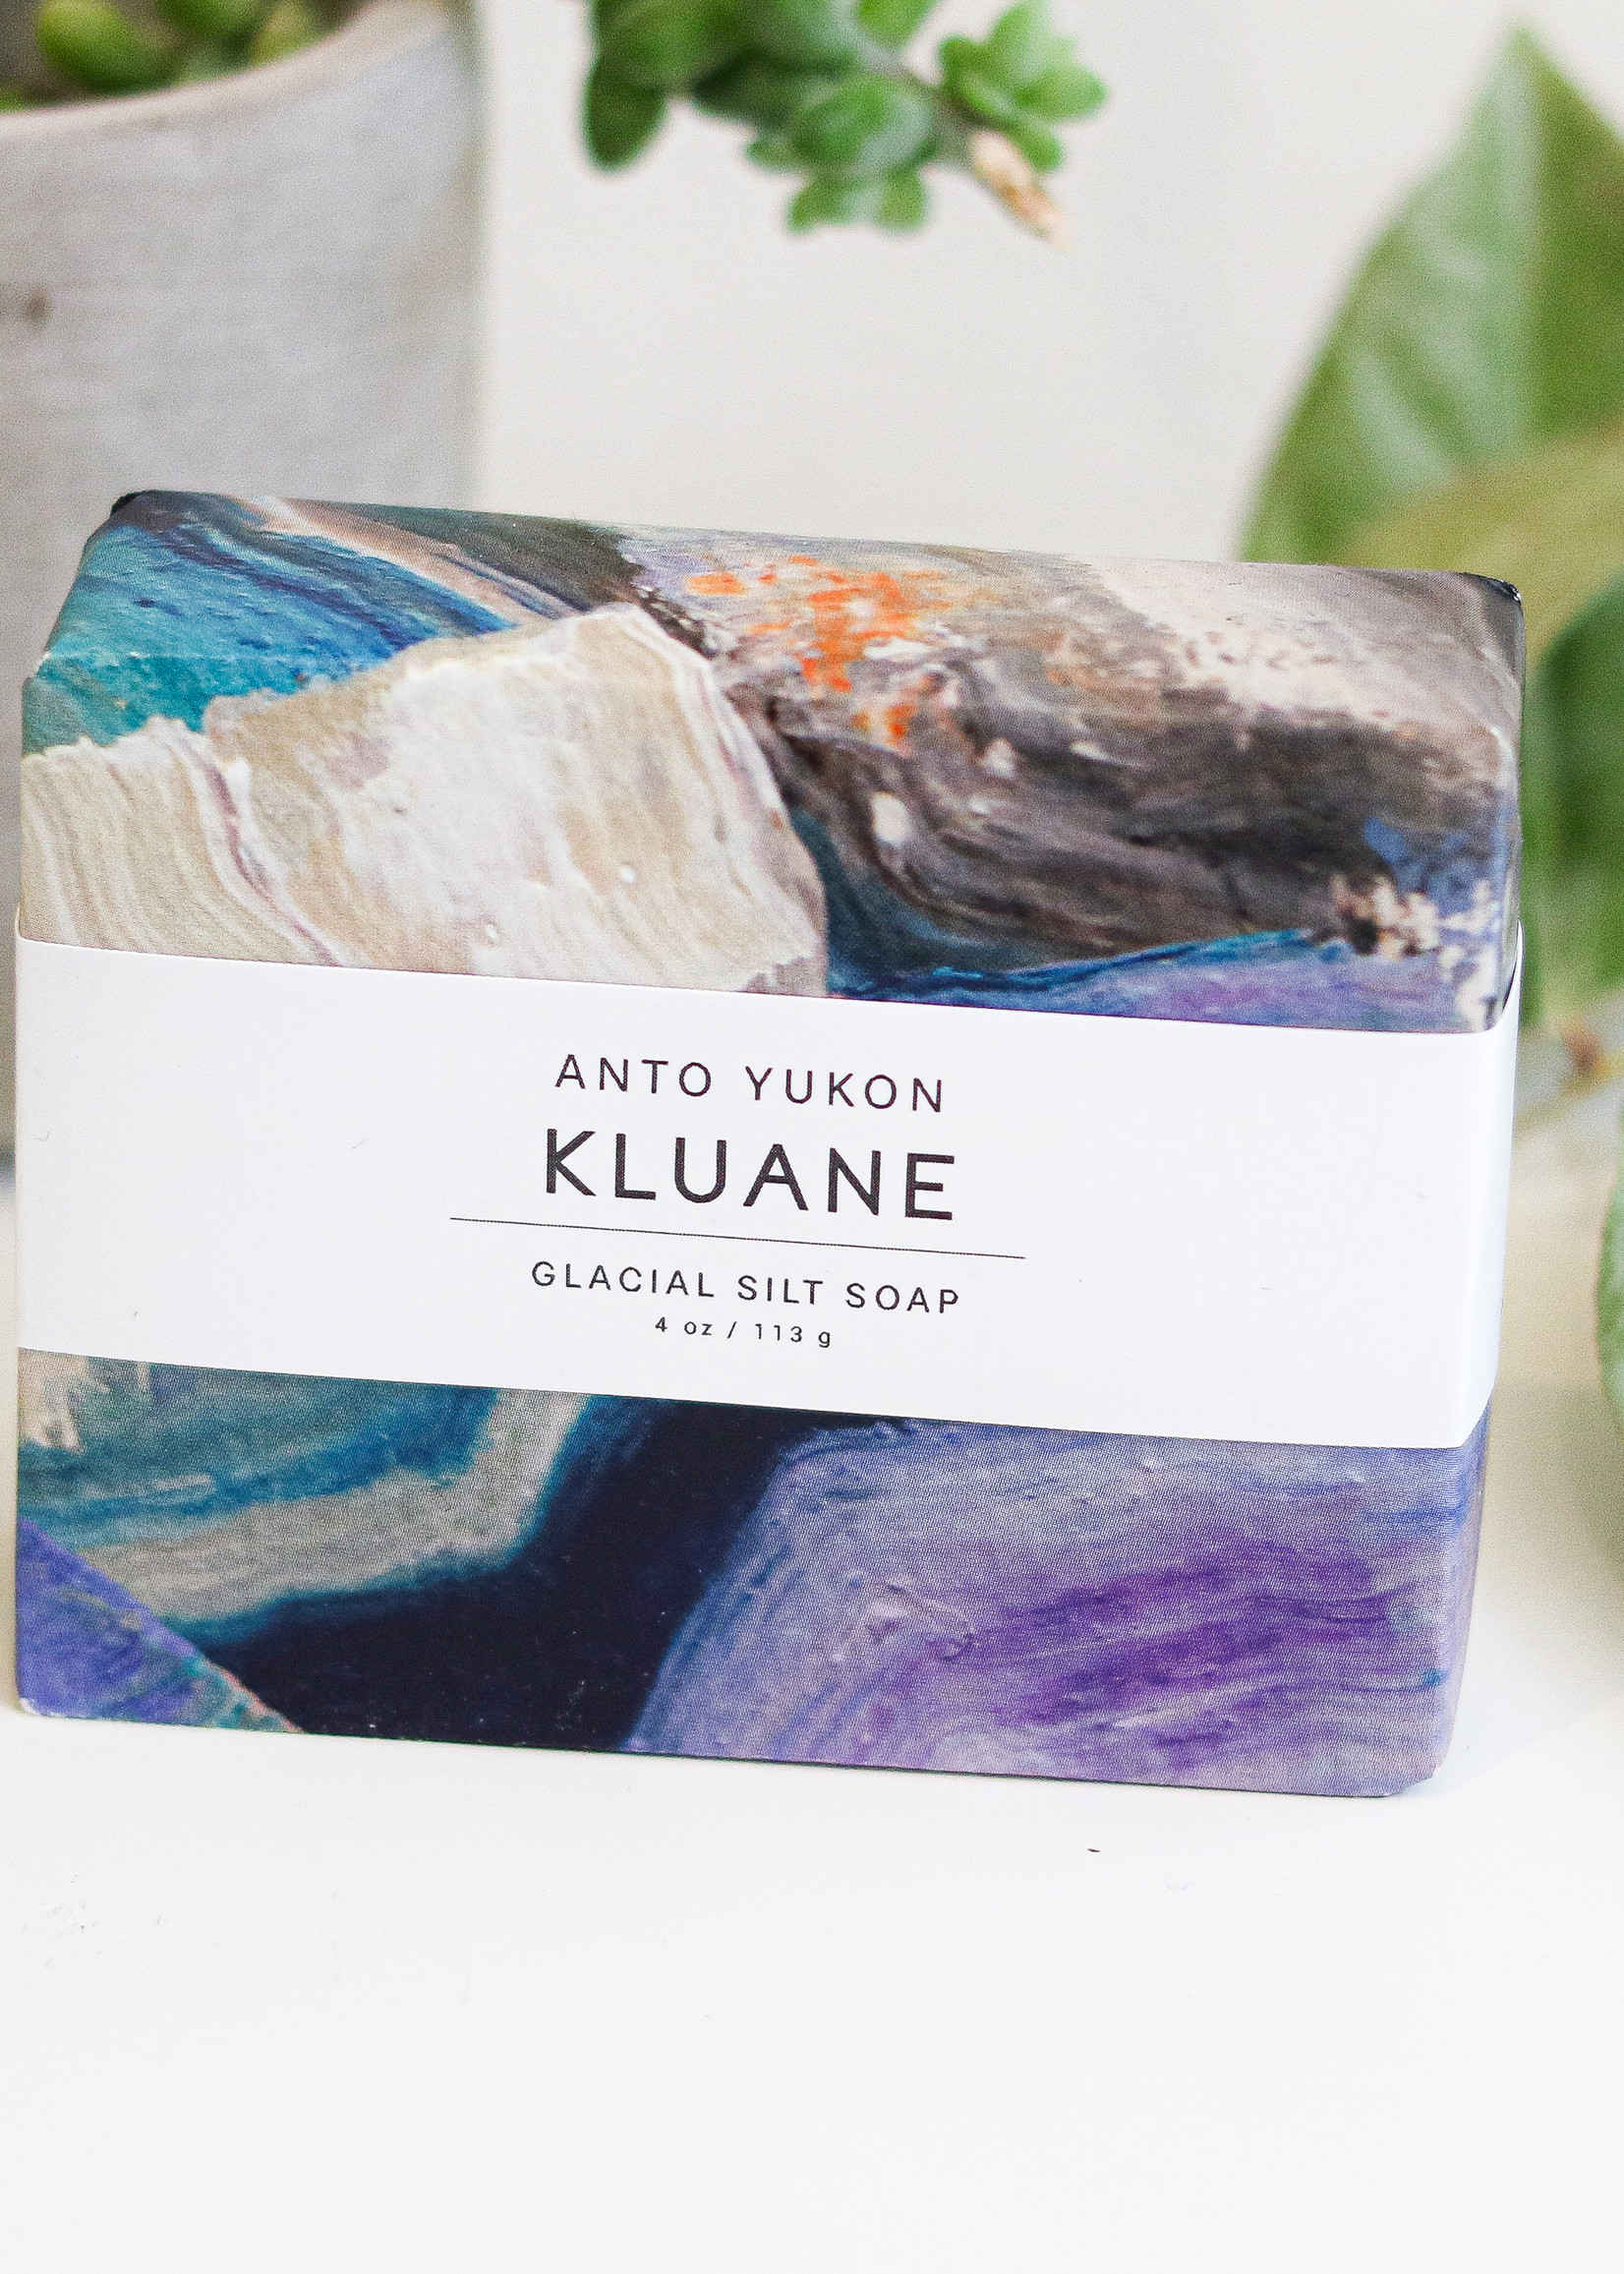 Anto Yukon Anto Yukon - Kluane Soap